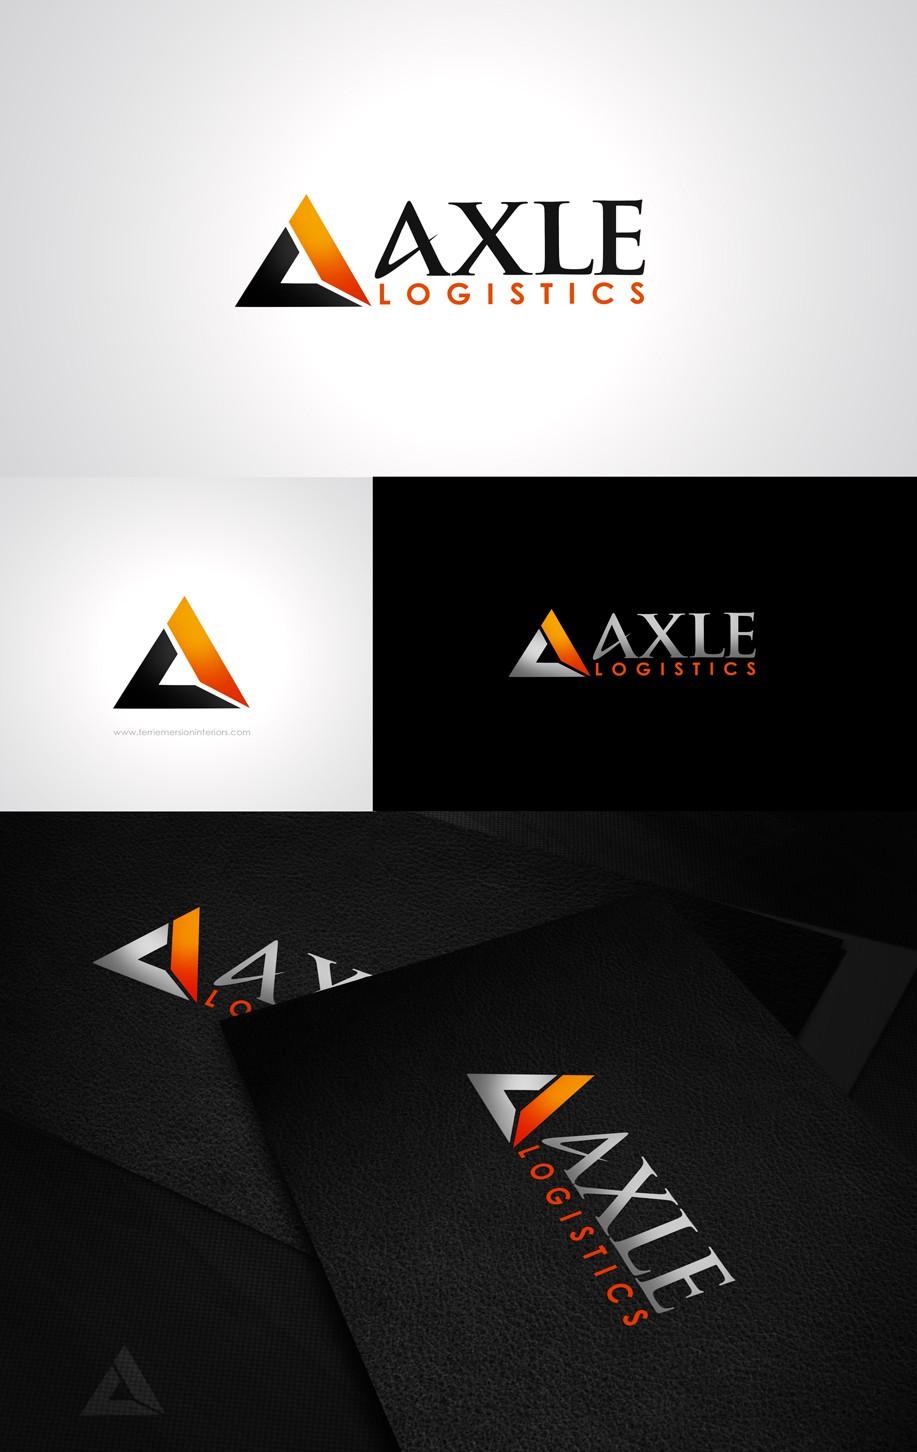 Axle Logistics needs a new logo